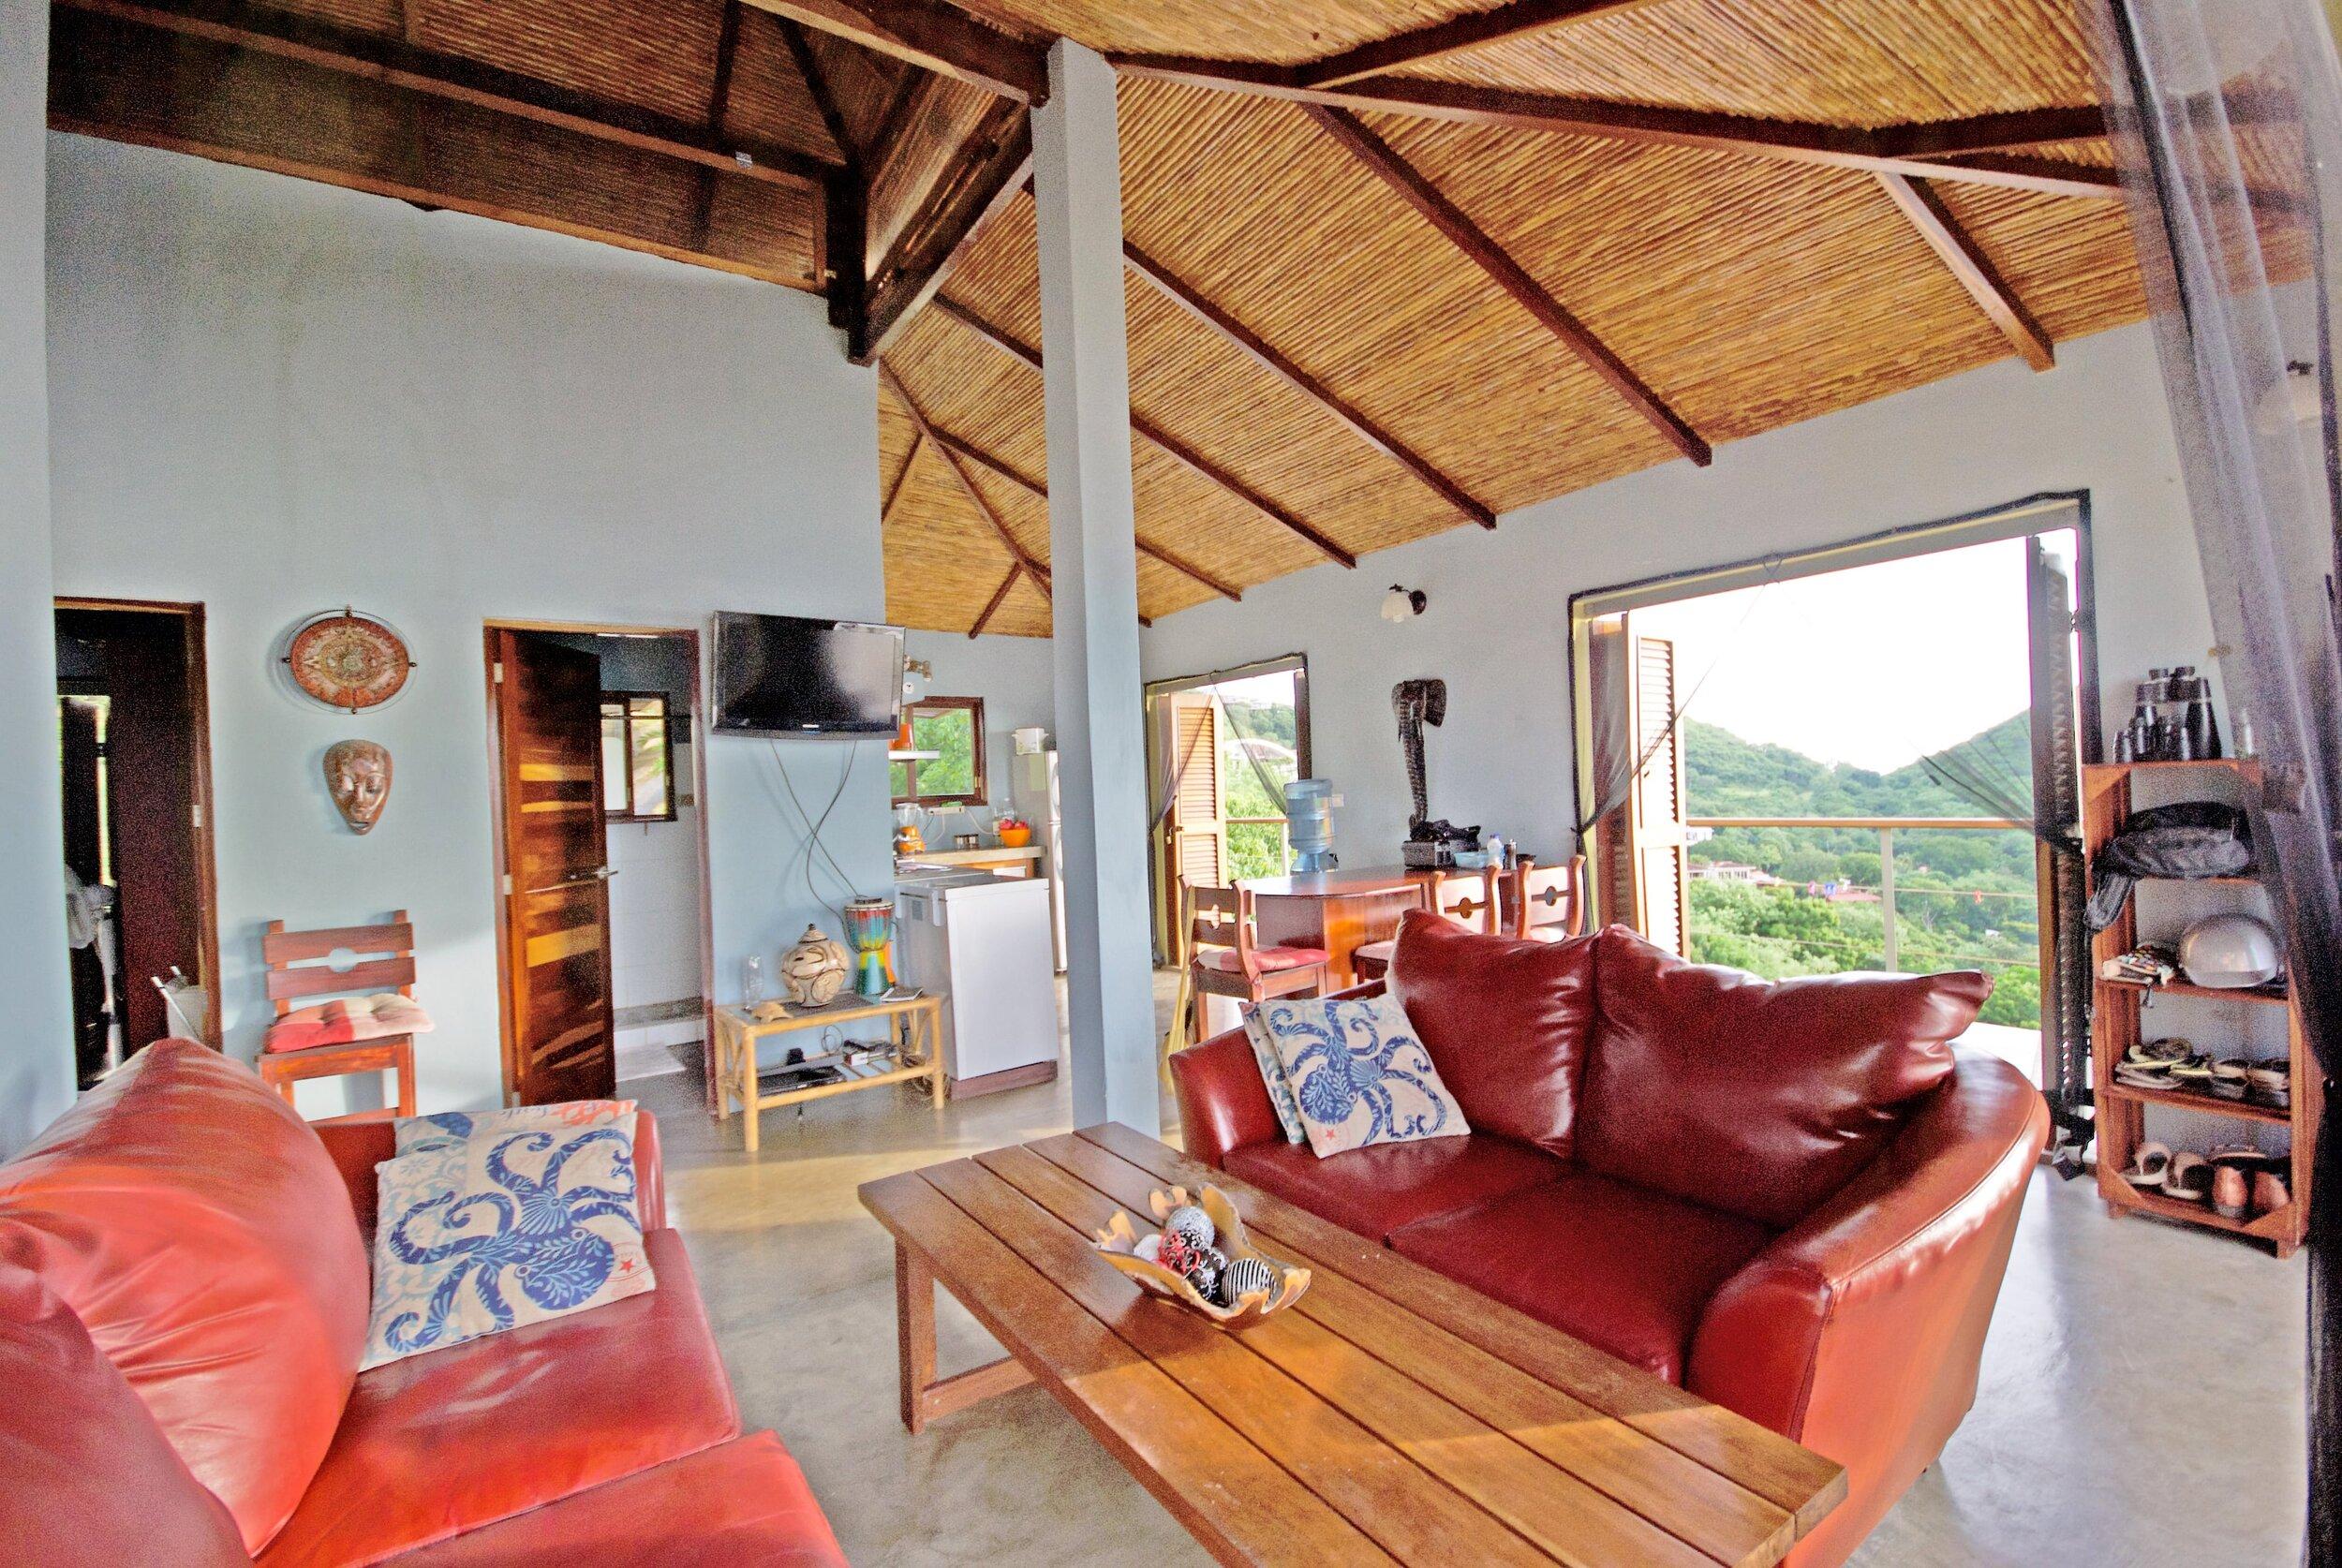 Ocean View Home For Sale San Juan Del Sur 7.jpg